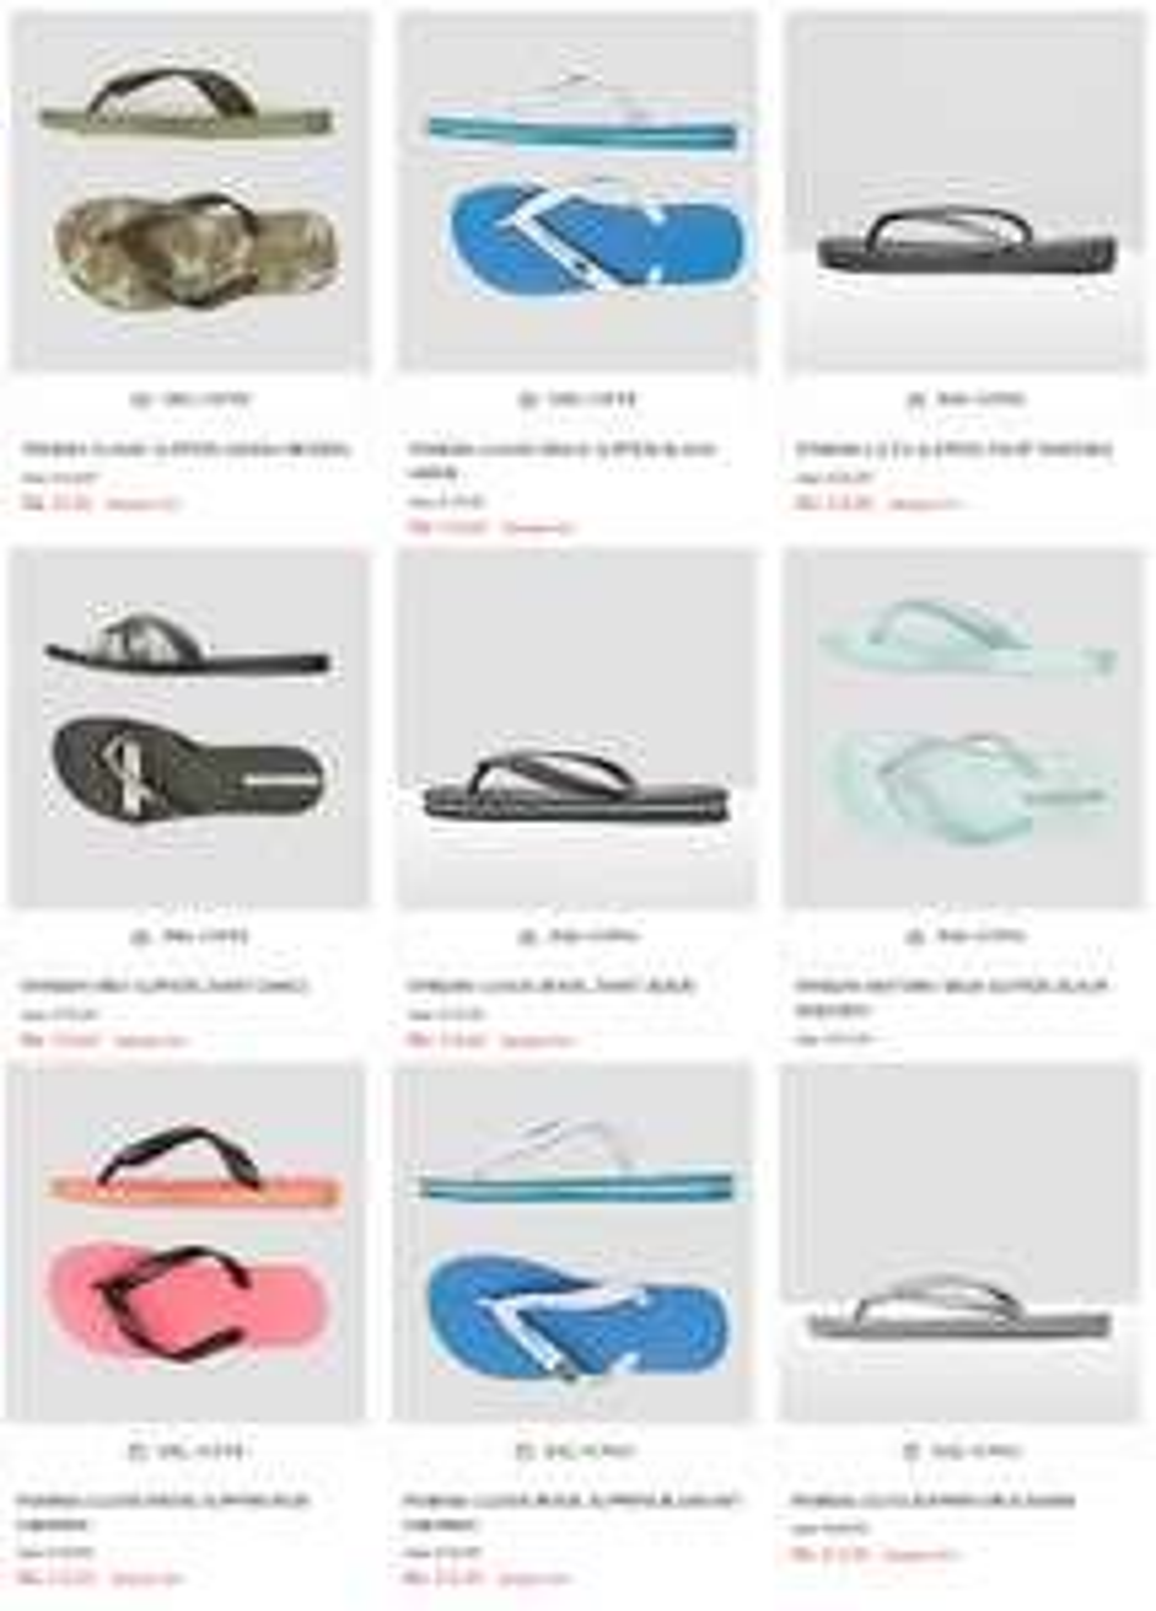 Ipanema slippers sale: €7,50 - €12,50